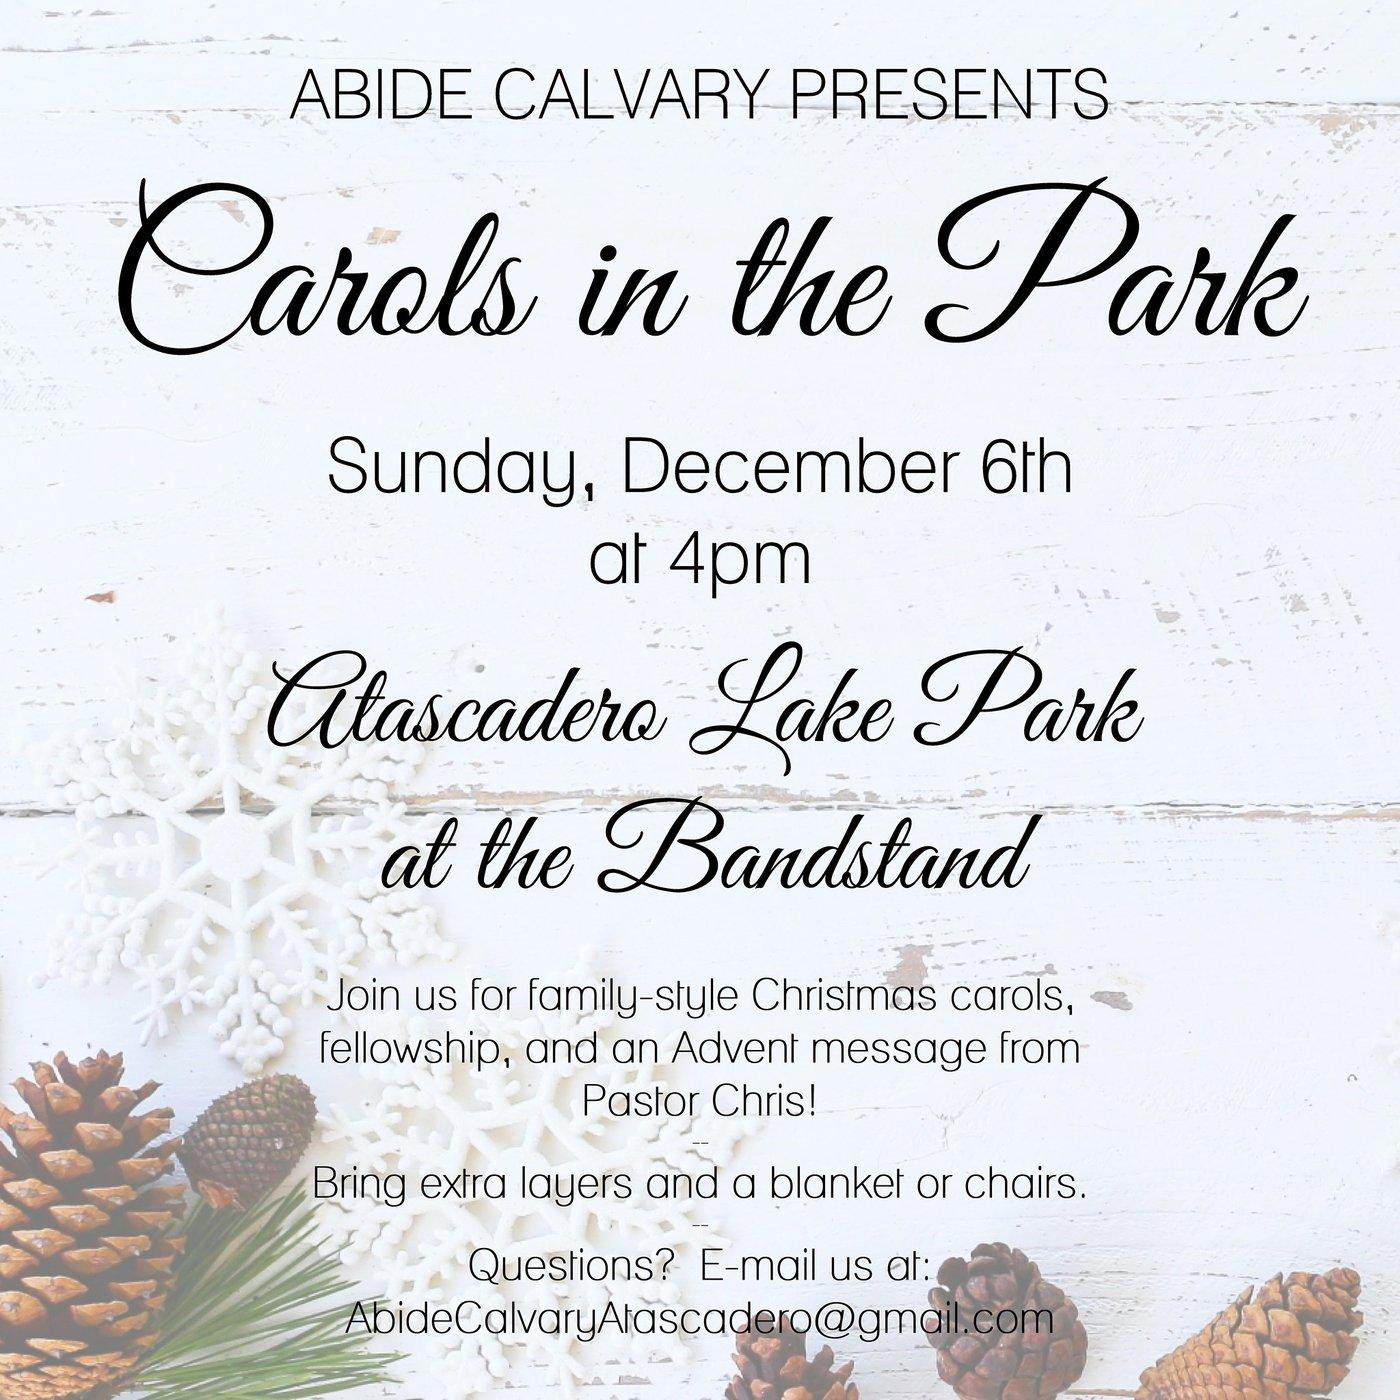 Abide Calvary - Carols in the Park